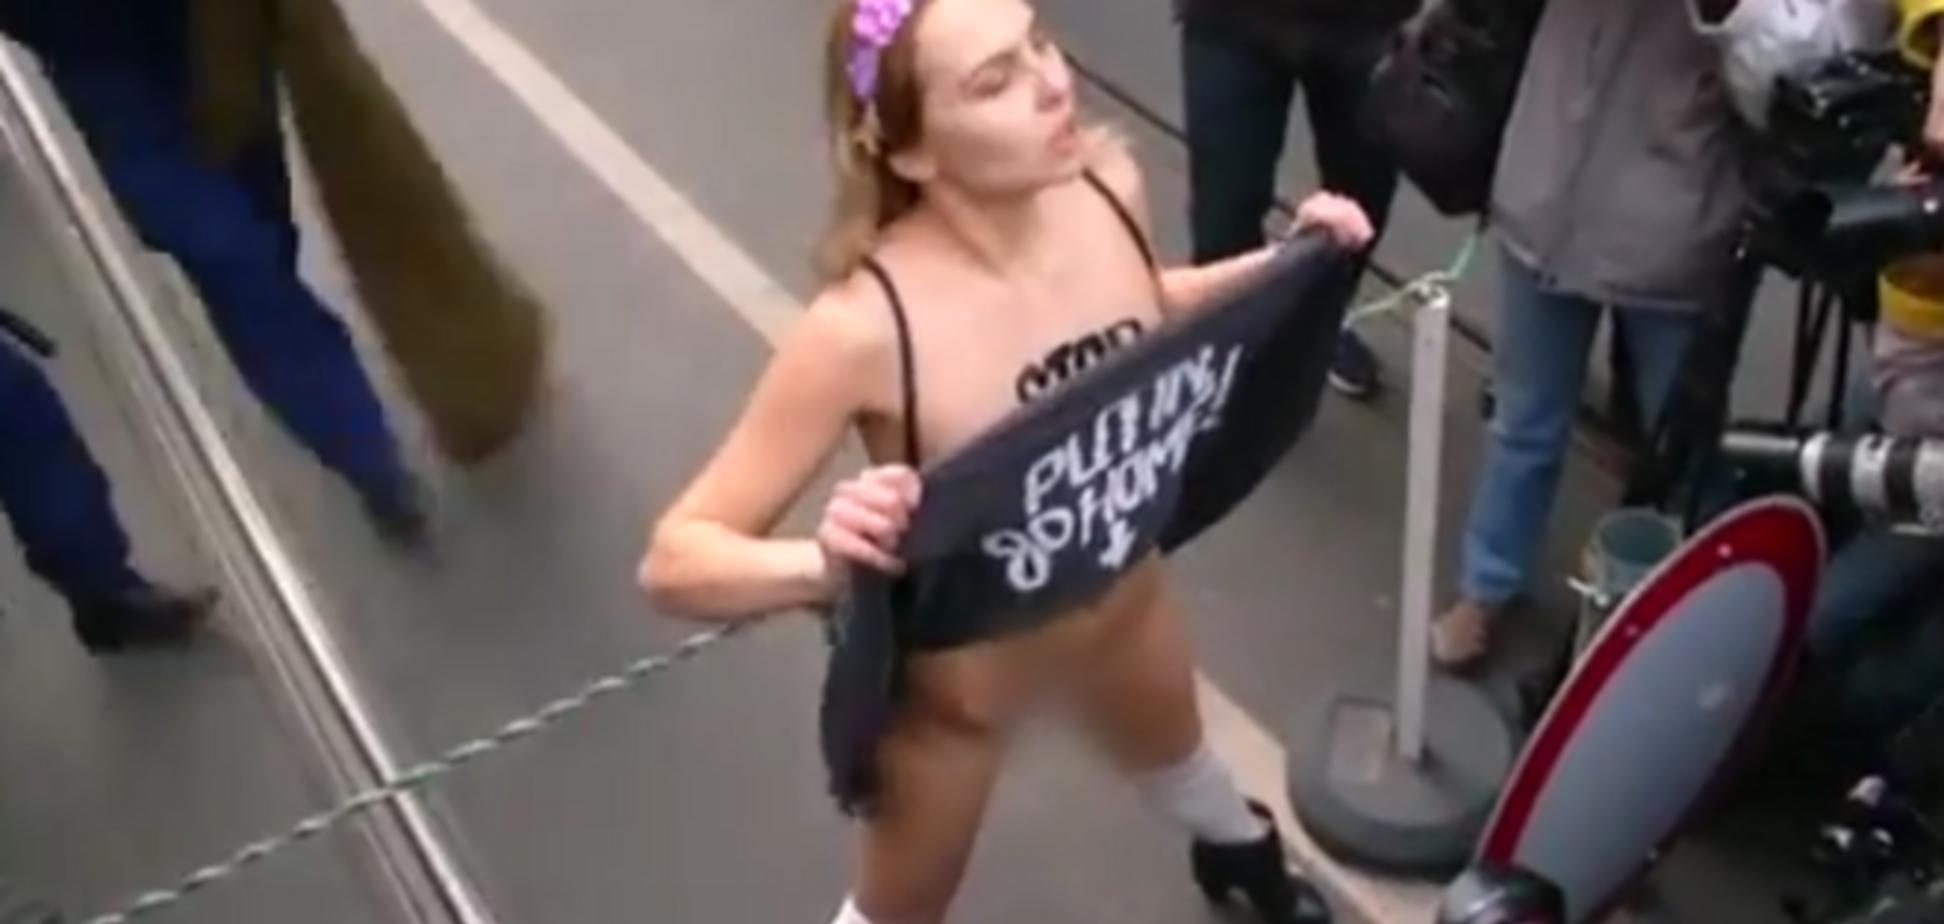 'Х*йло, езжай домой!' Активистка Femen разделась в Будапеште из-за Путина: видеофакт